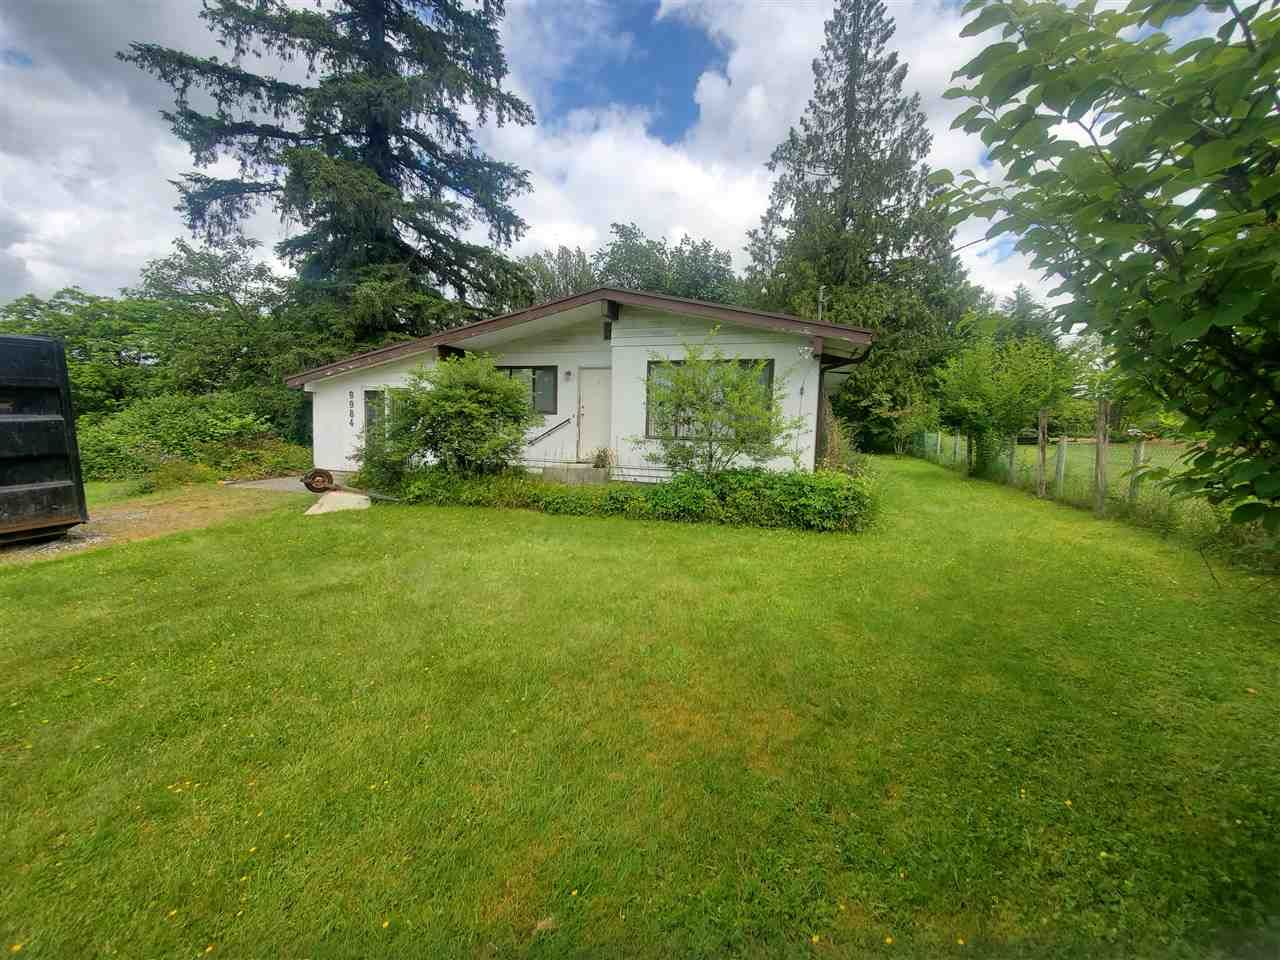 Main Photo: 9984 276 STREET in Maple Ridge: Whonnock House for sale : MLS®# R2465568